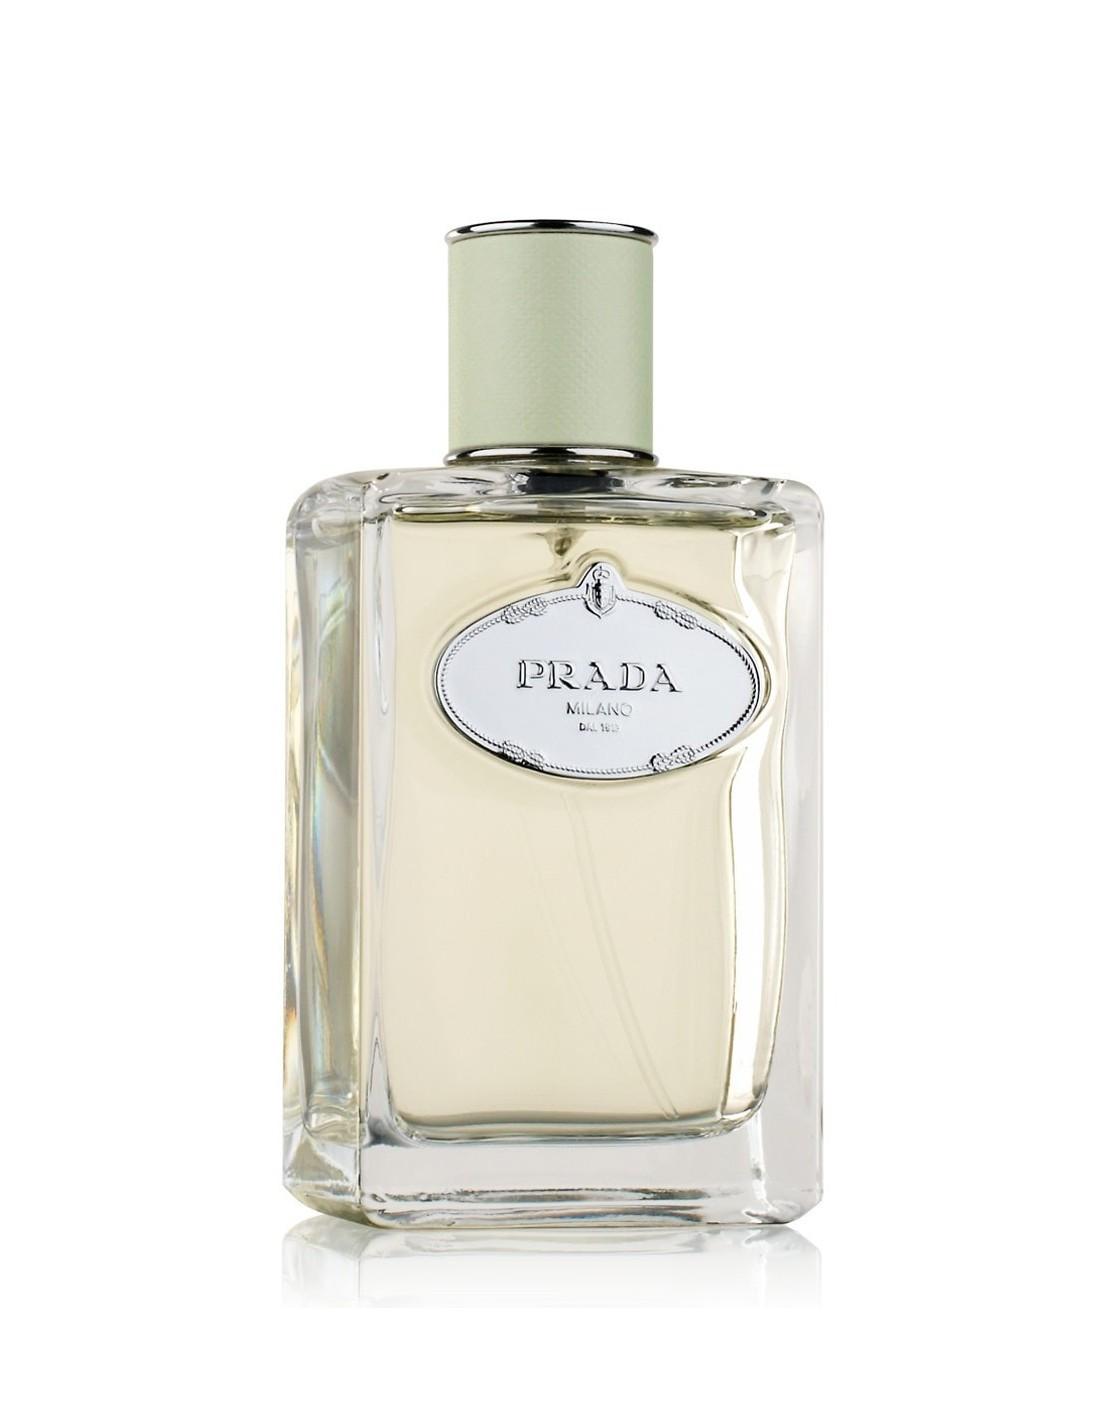 Eau Tester D'iris Infusion Parfum100 Ml Spray De Azzurra Prada hrdsQt